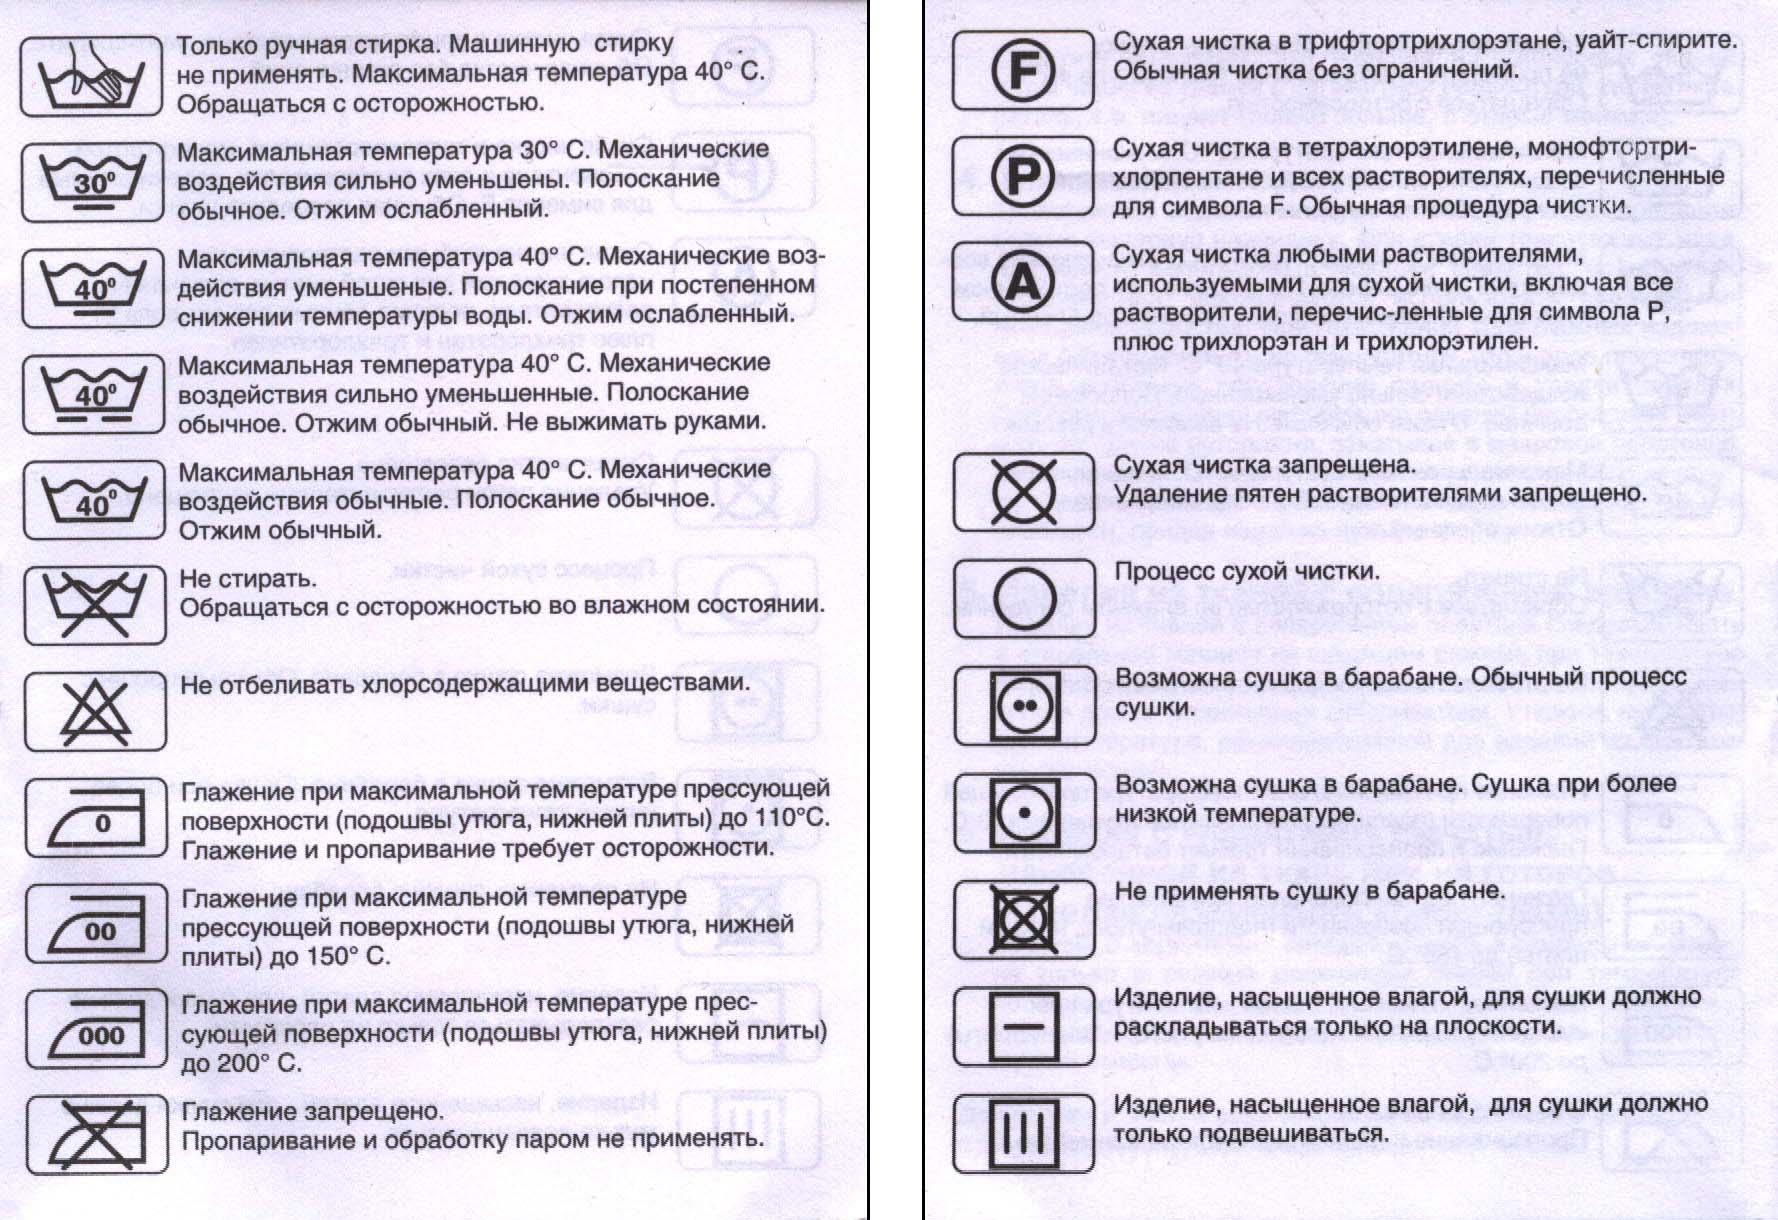 Скачати значки на одязі. Значения значков на ярлыках одежды adc3e2ebf591f